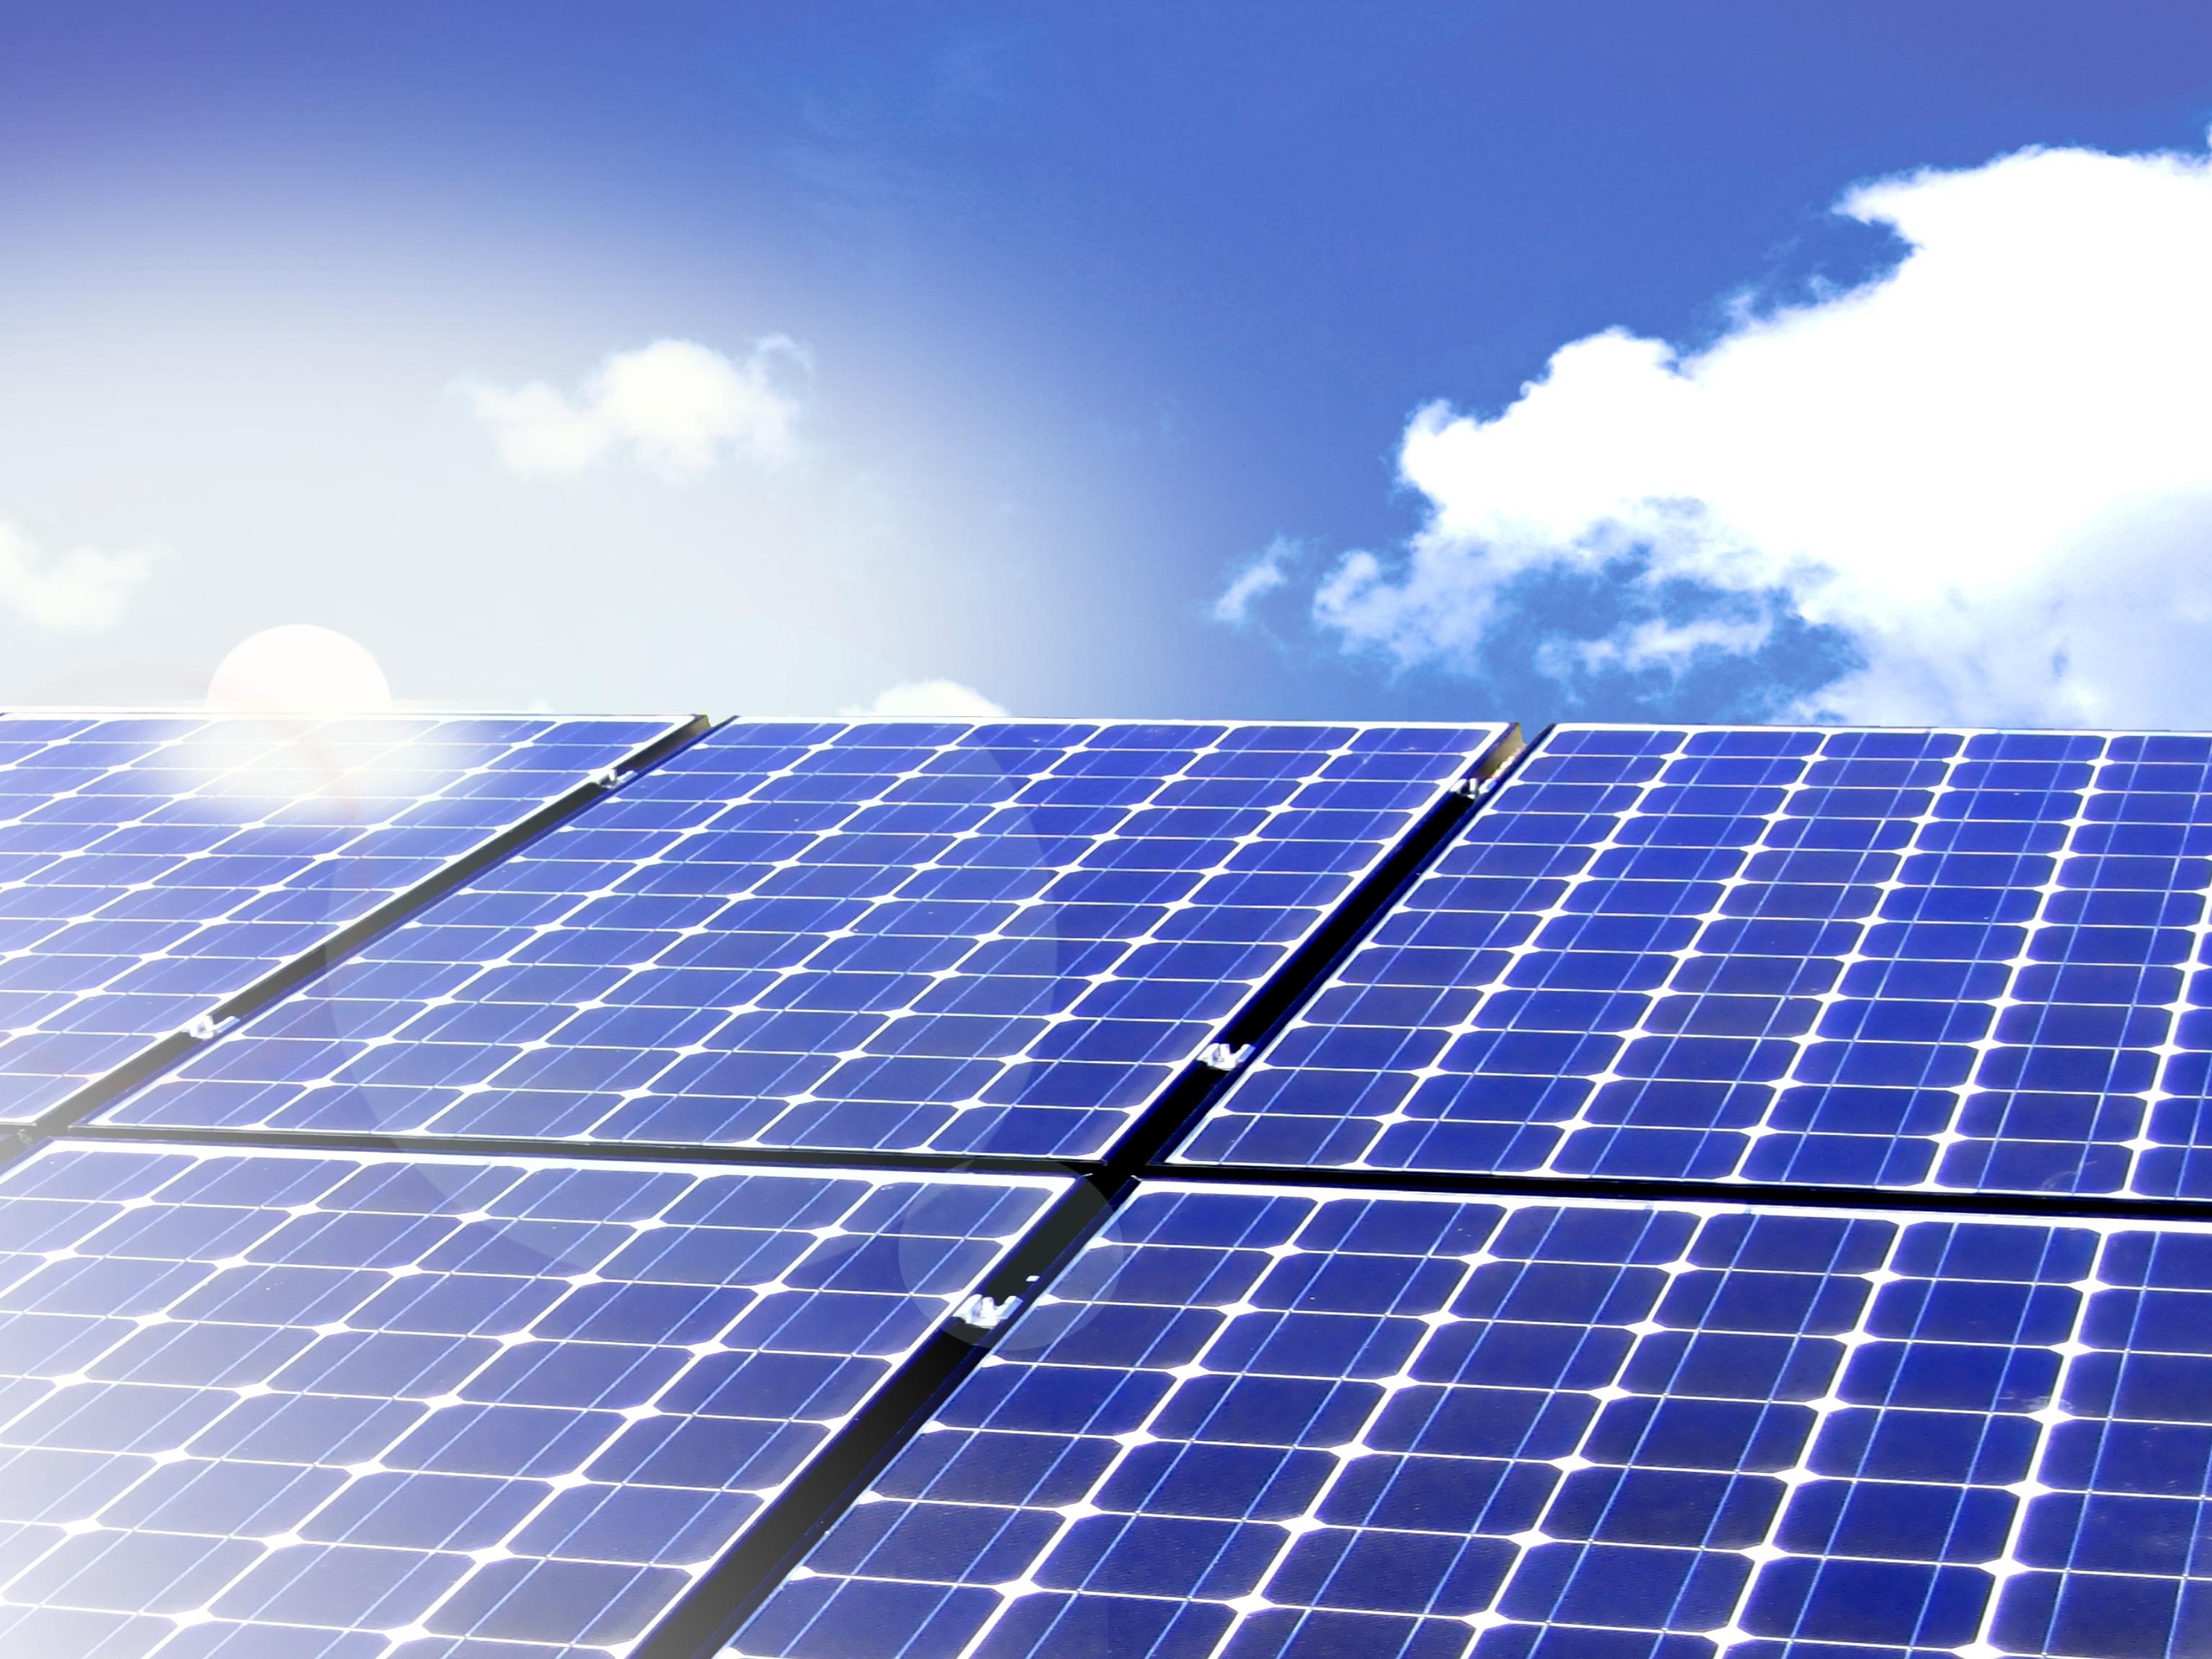 fotovoltaico 2016-17